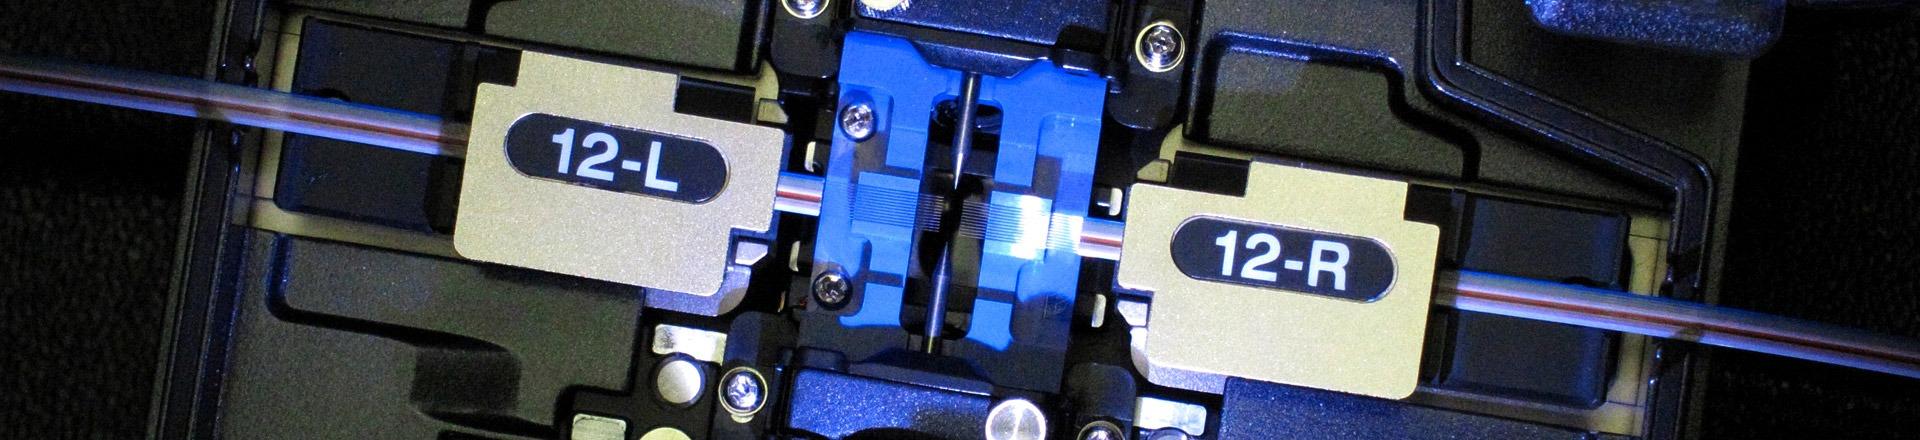 Test and Inspection - FITEL (Furukawa Electric)